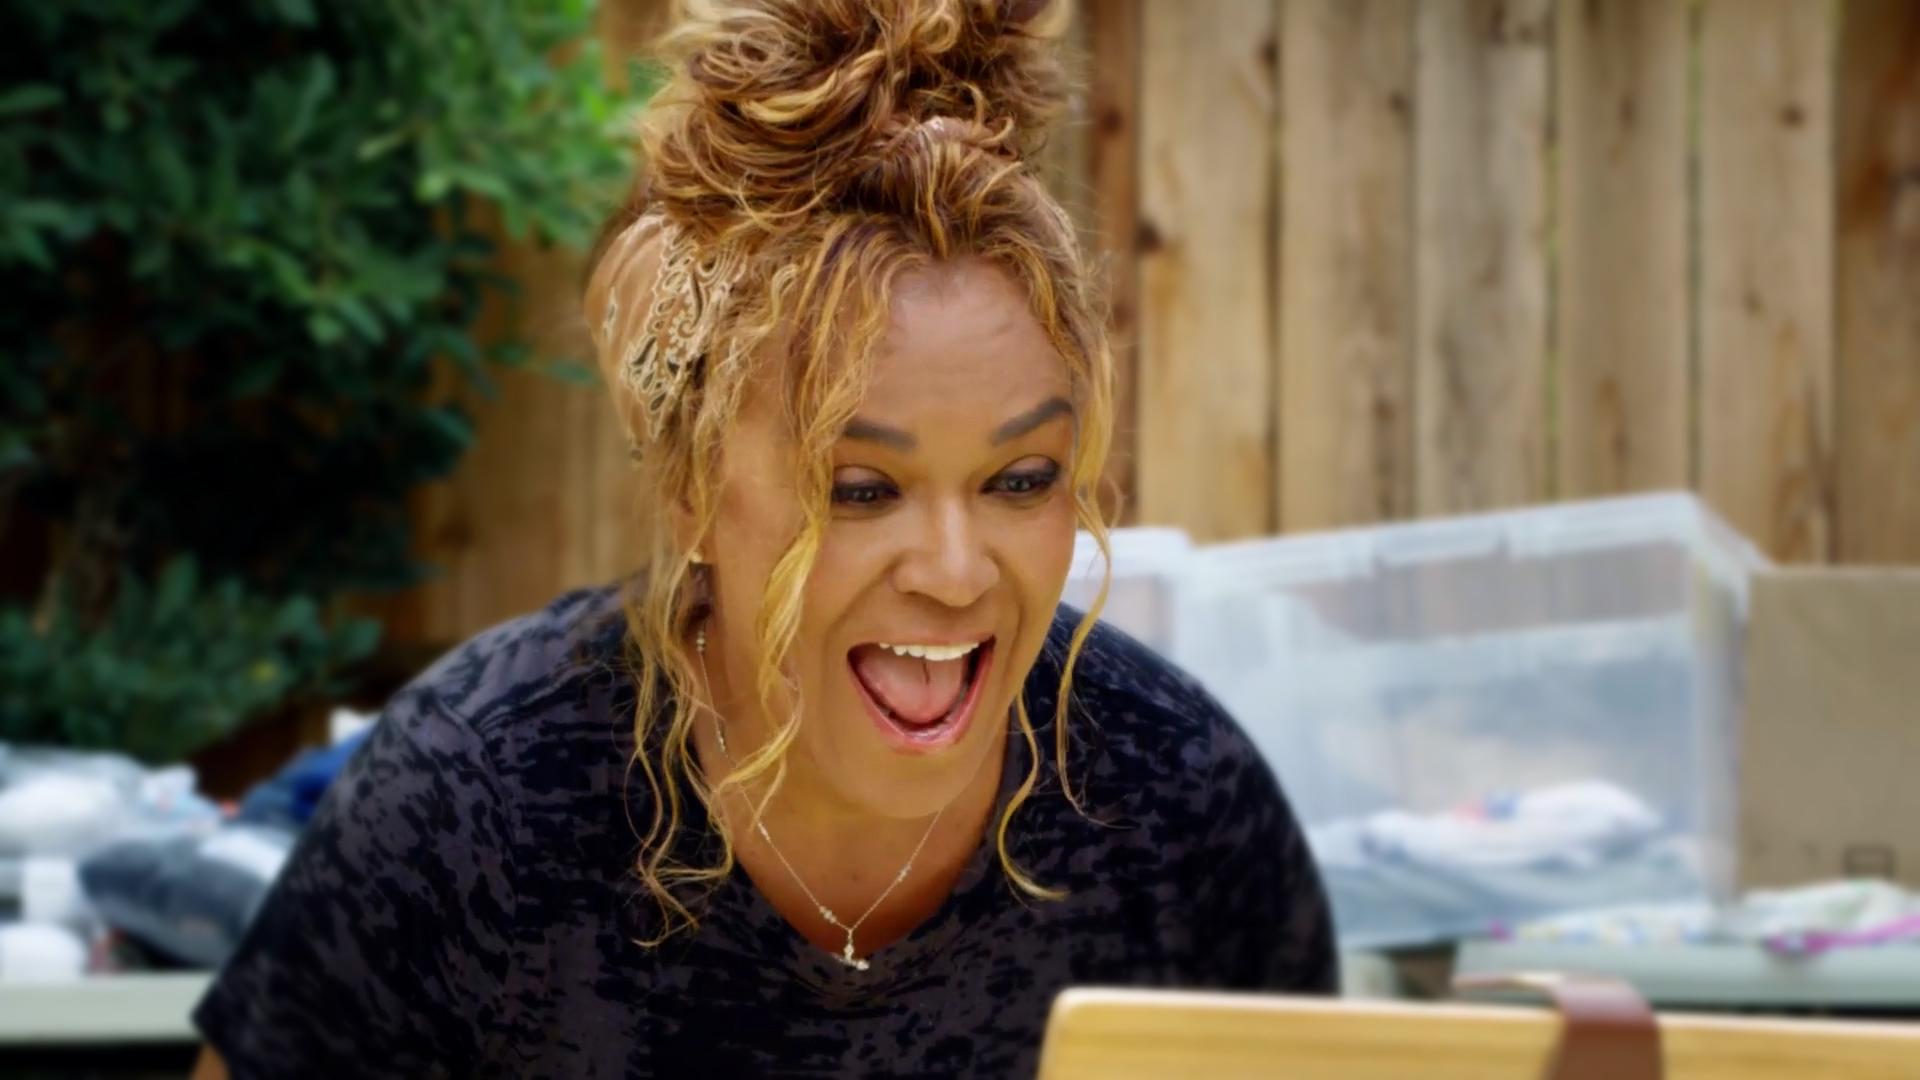 Amazon X Lays Brown Bag Lady #JoyGivers